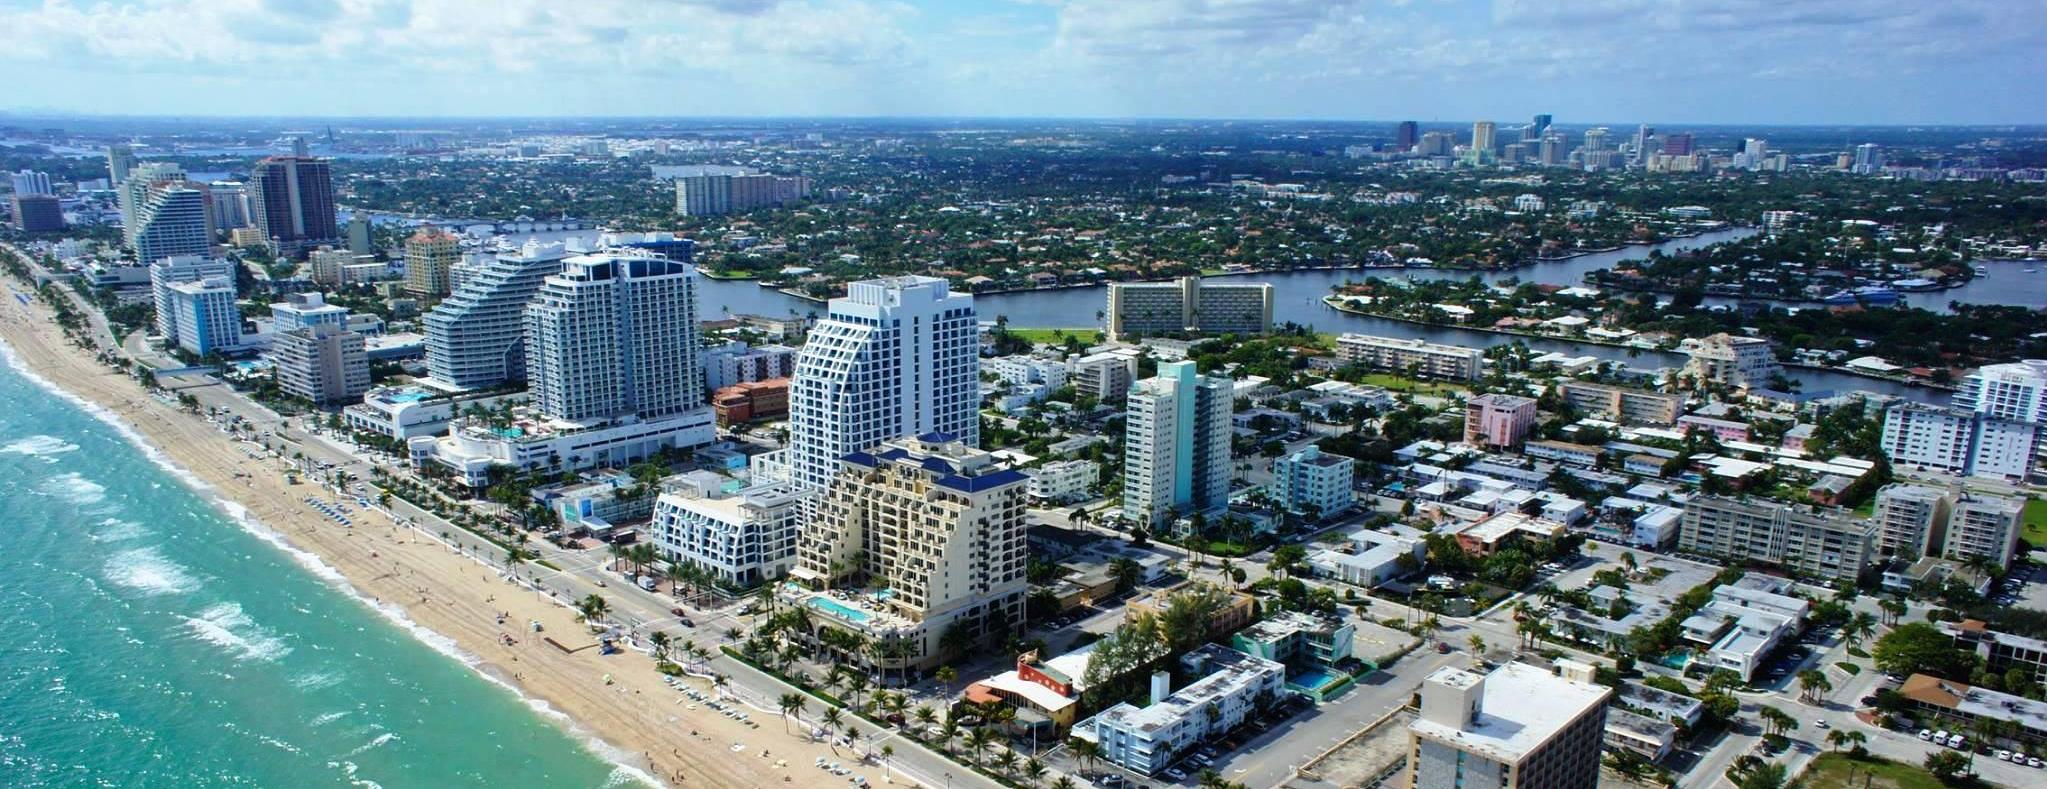 Feature Fort Lauderdale Fl